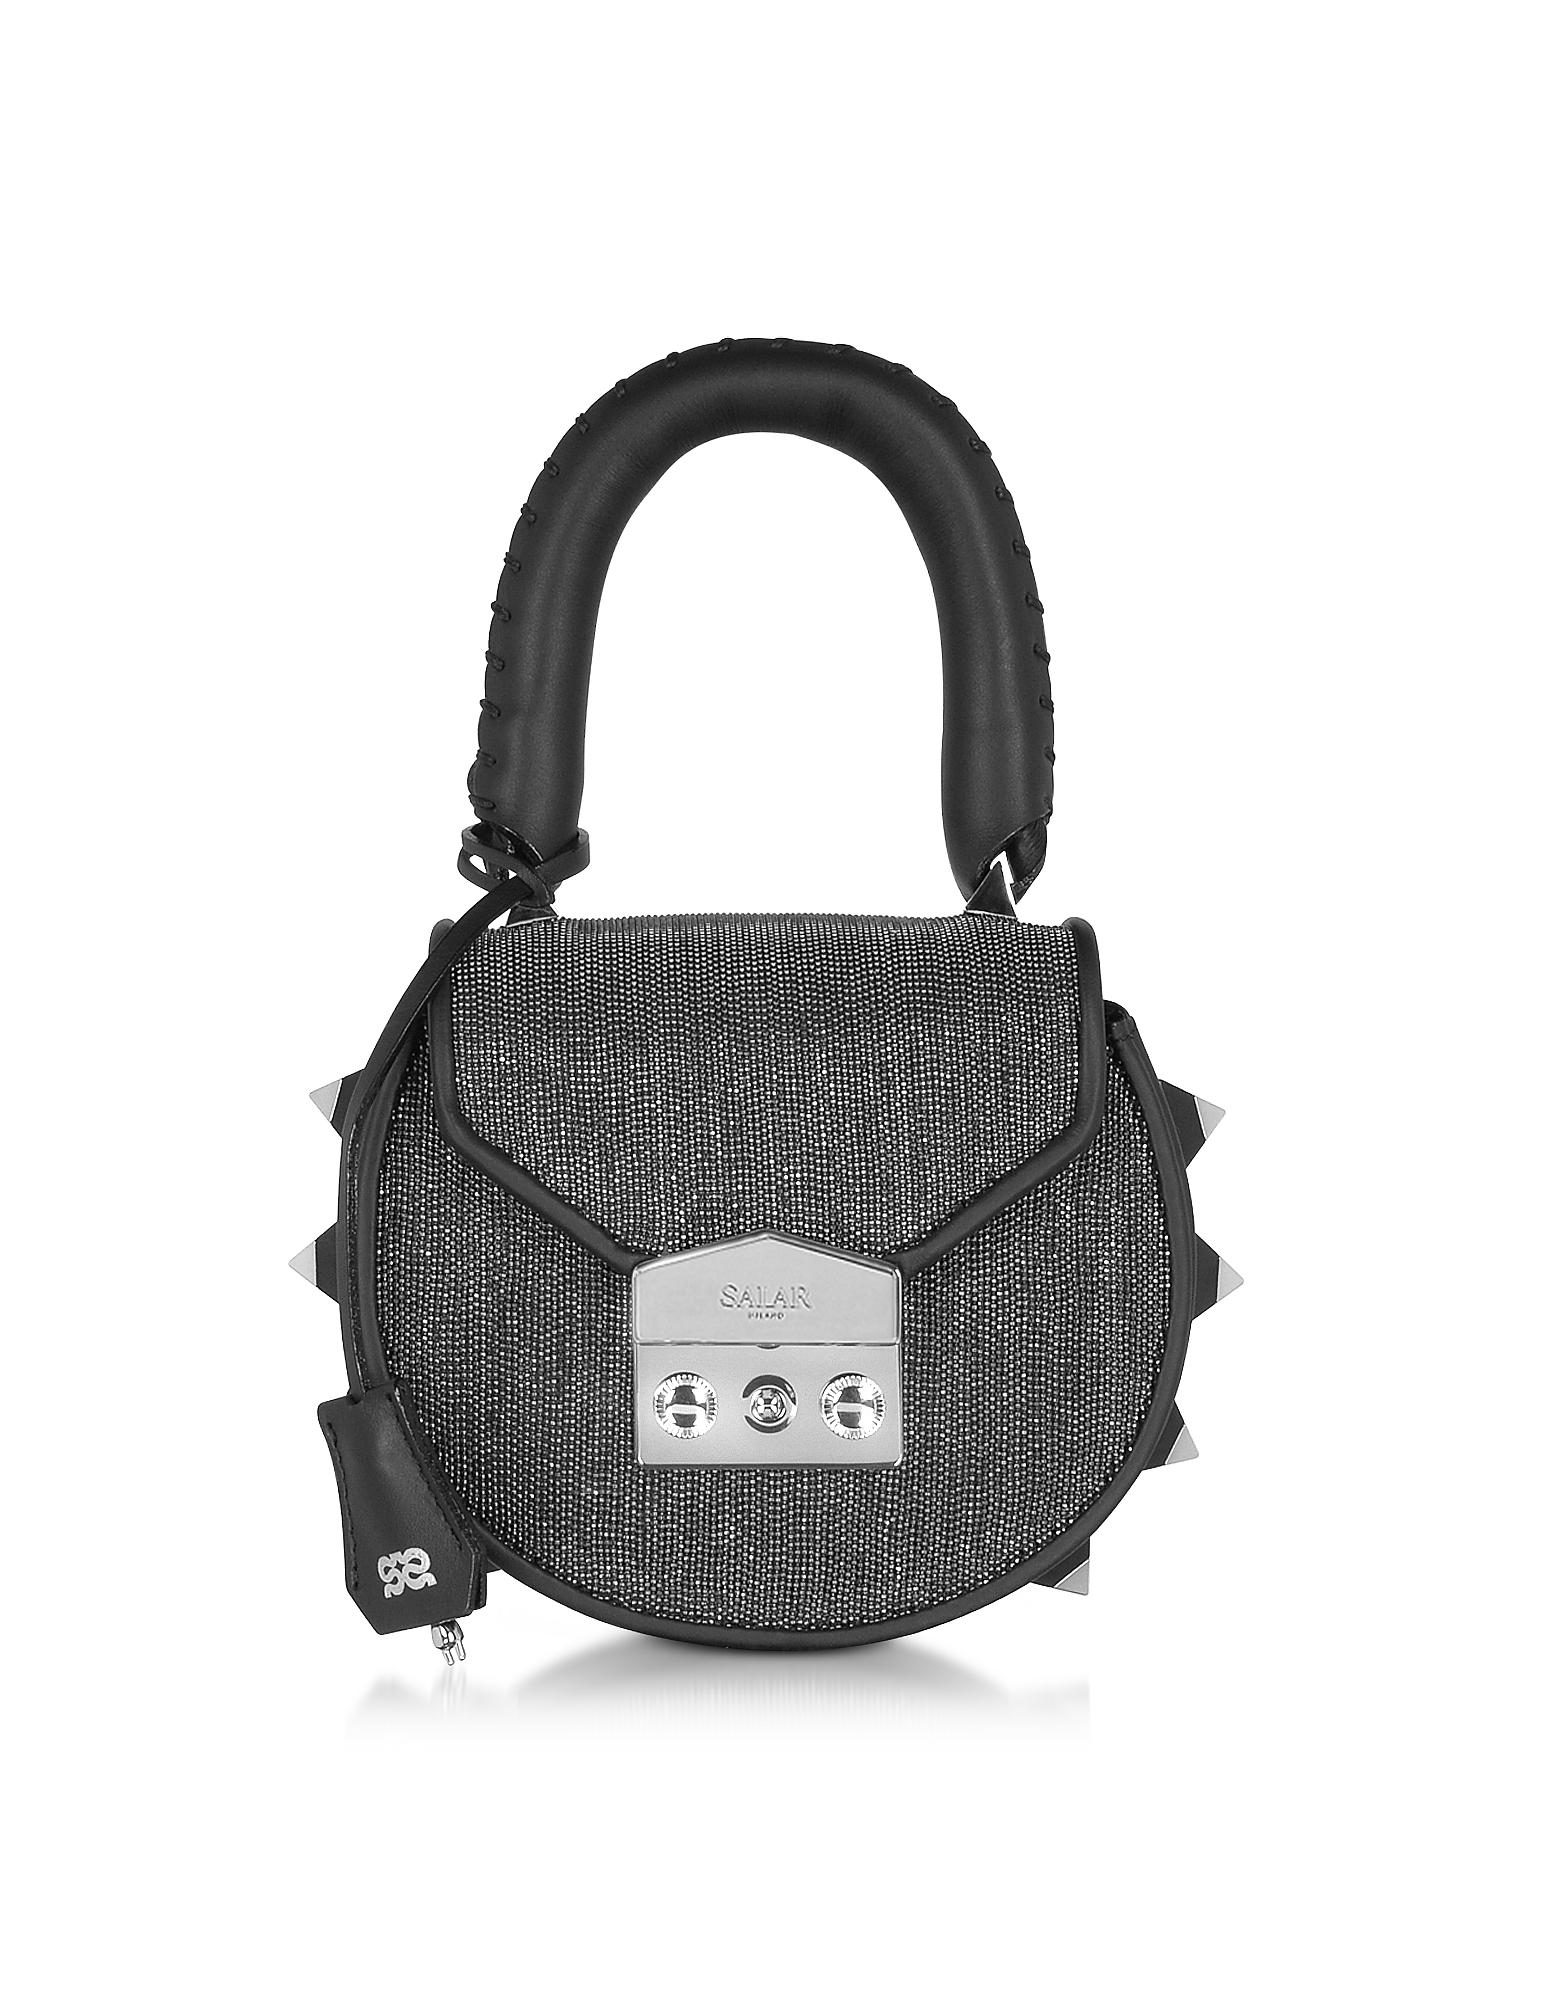 Salar Handbags, Mimi Mini Disco Gunmetal Shoulder Bag